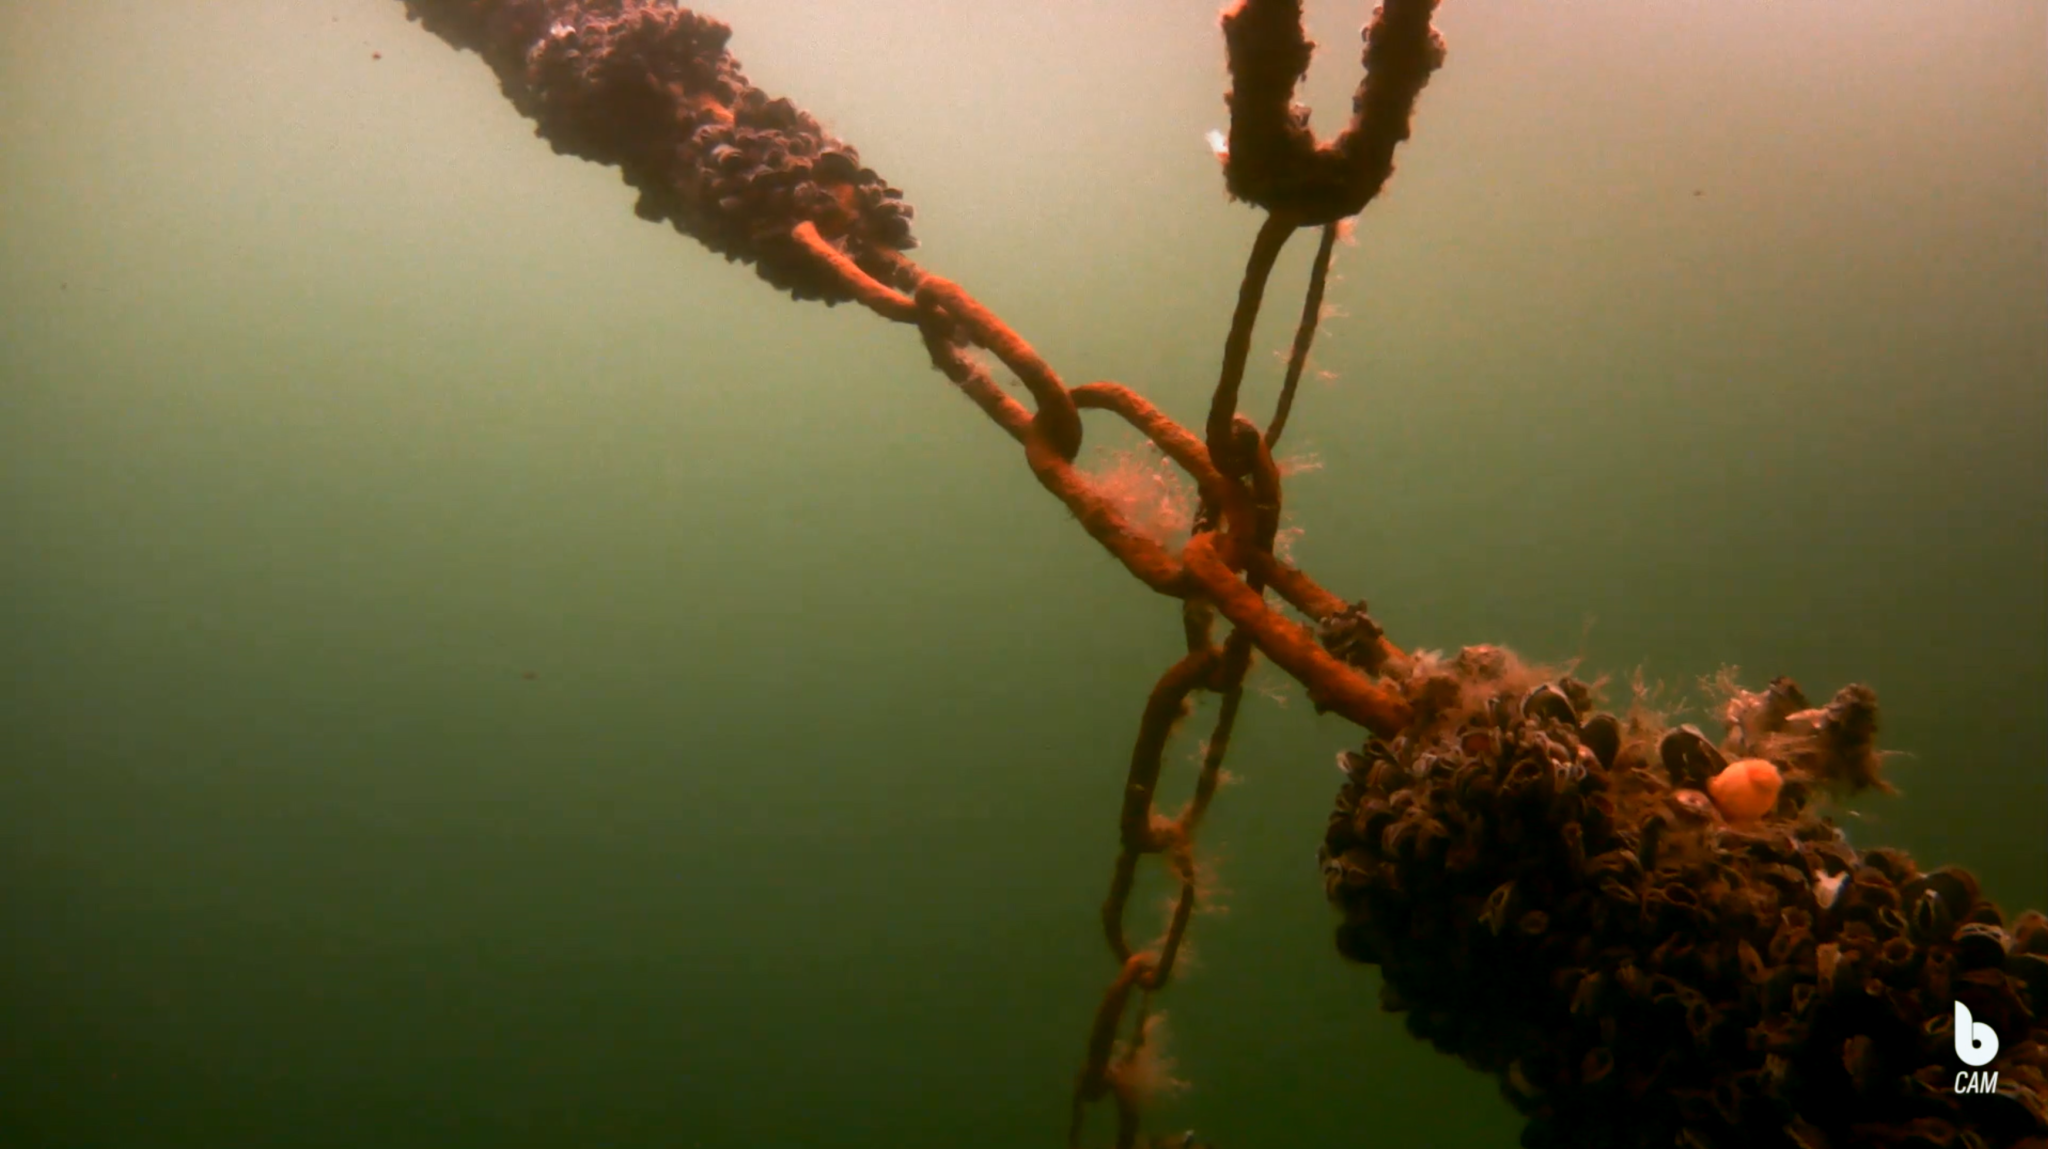 Underwater drone footage